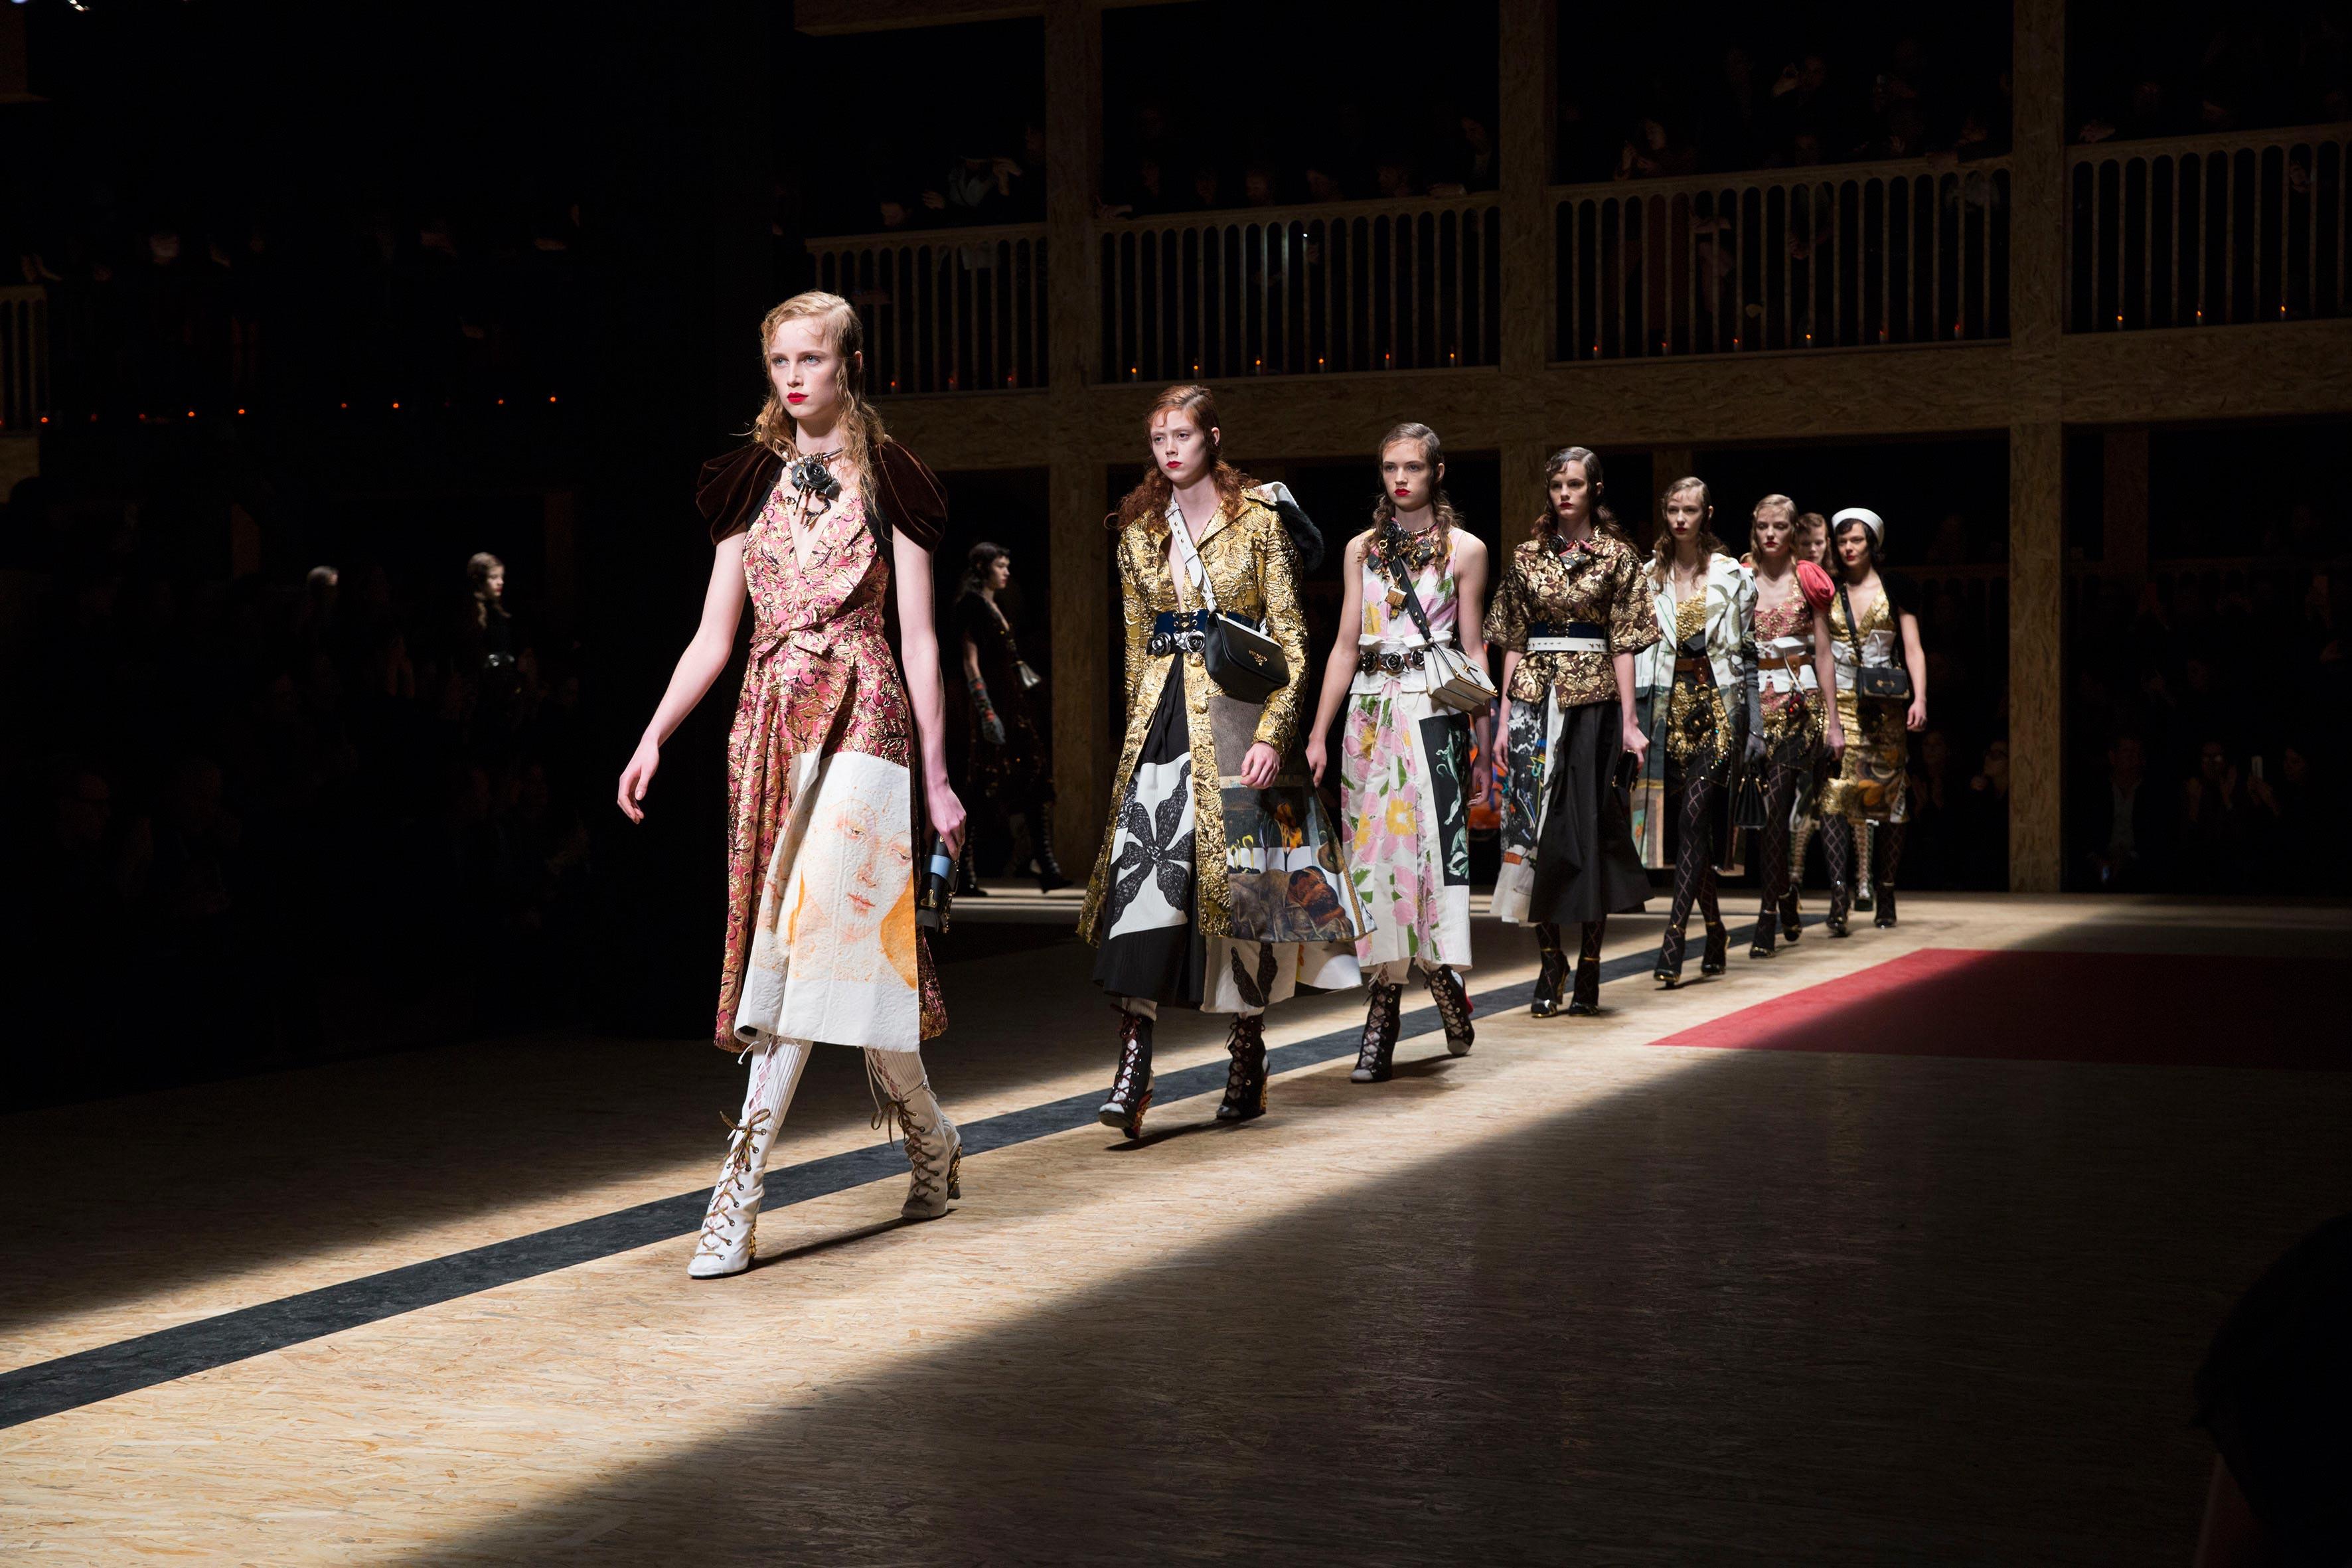 Prada-Women's-FW16_Fashion-showspace_-Parade_01